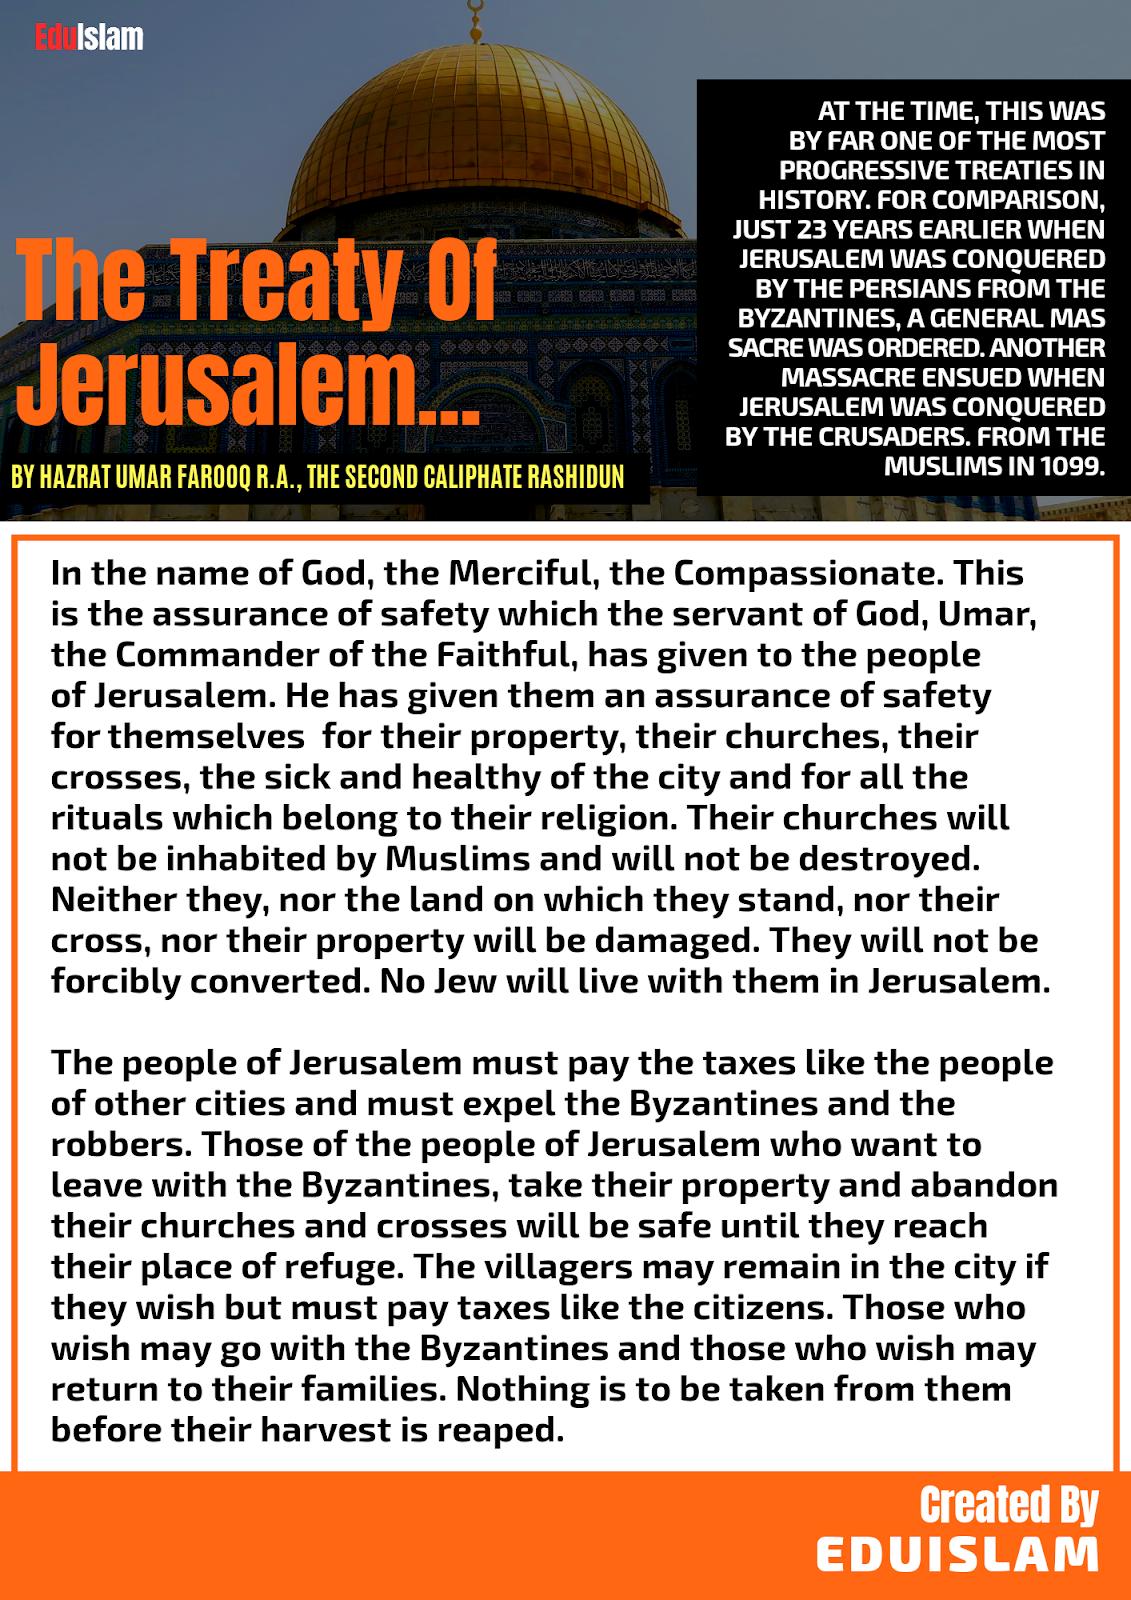 Treaty Of Jerusalem by Umar Farooq R.A., History of Al-Aqsa Mosque, Jerusalem History, Hazrat Umar ibn al-Khattab Treaty, Lost Islamic History